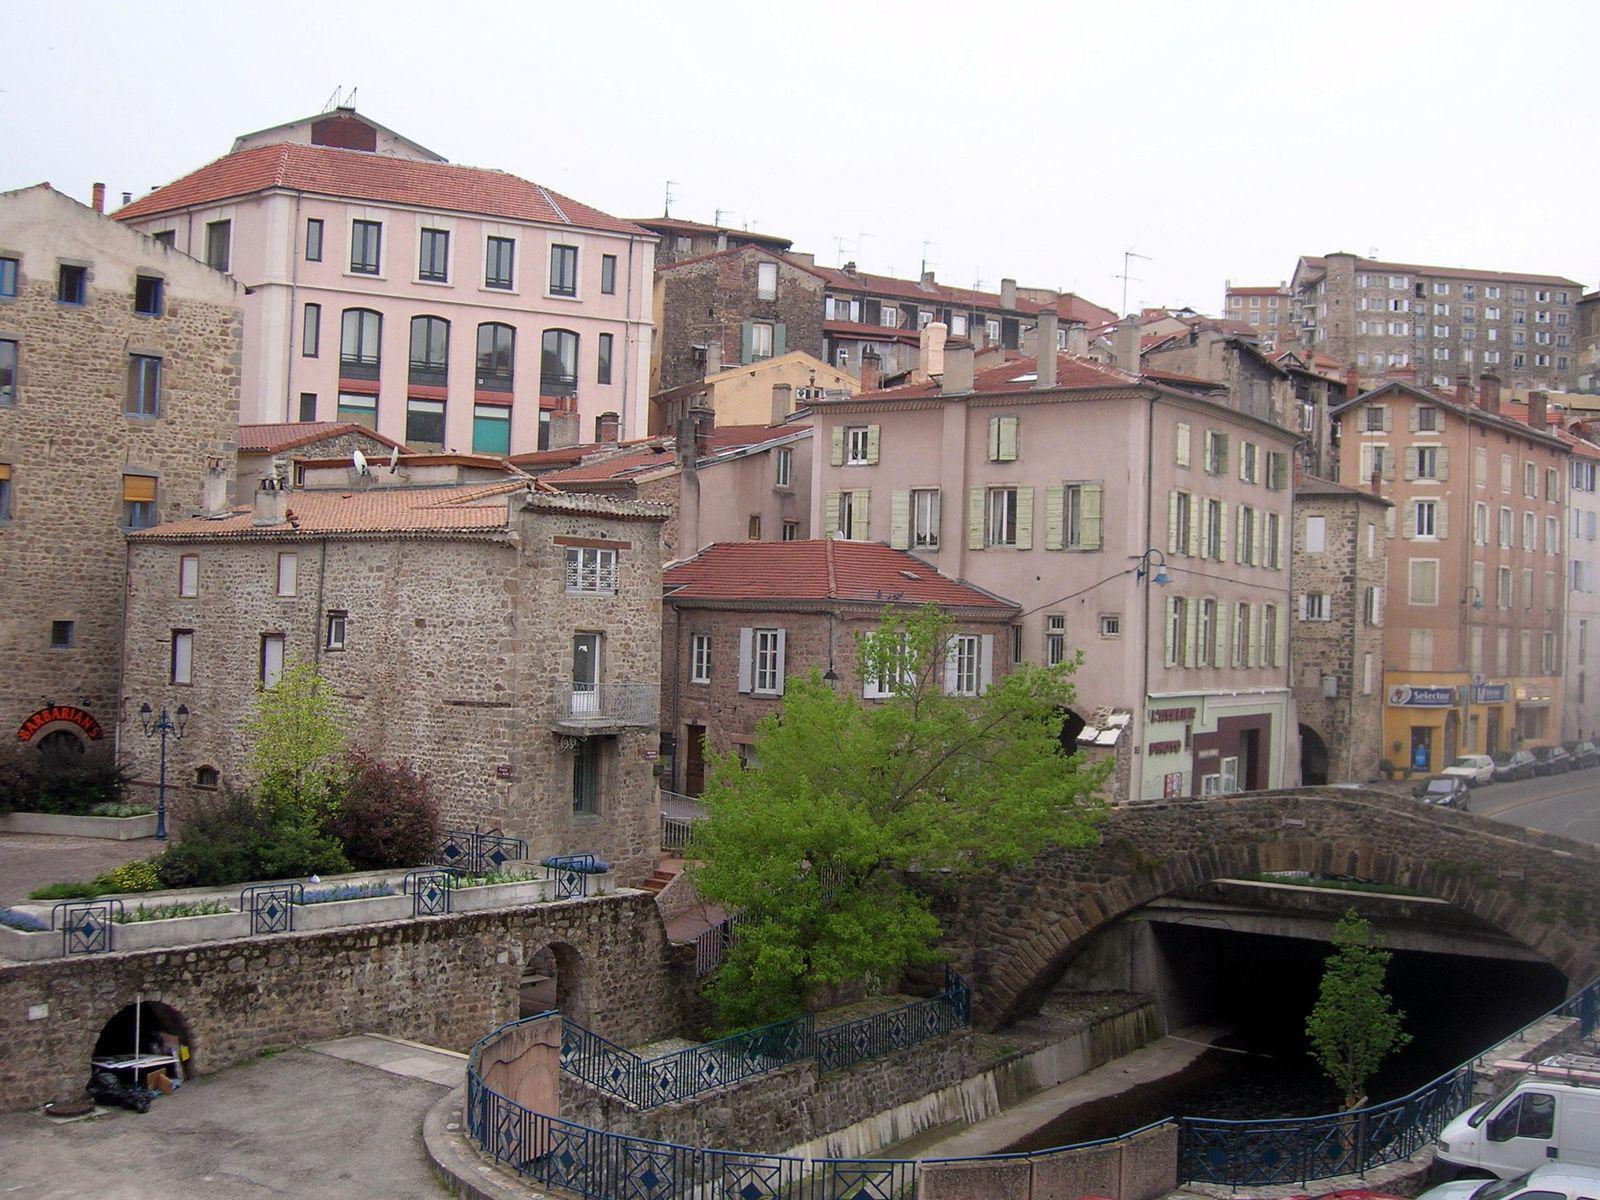 Annonay